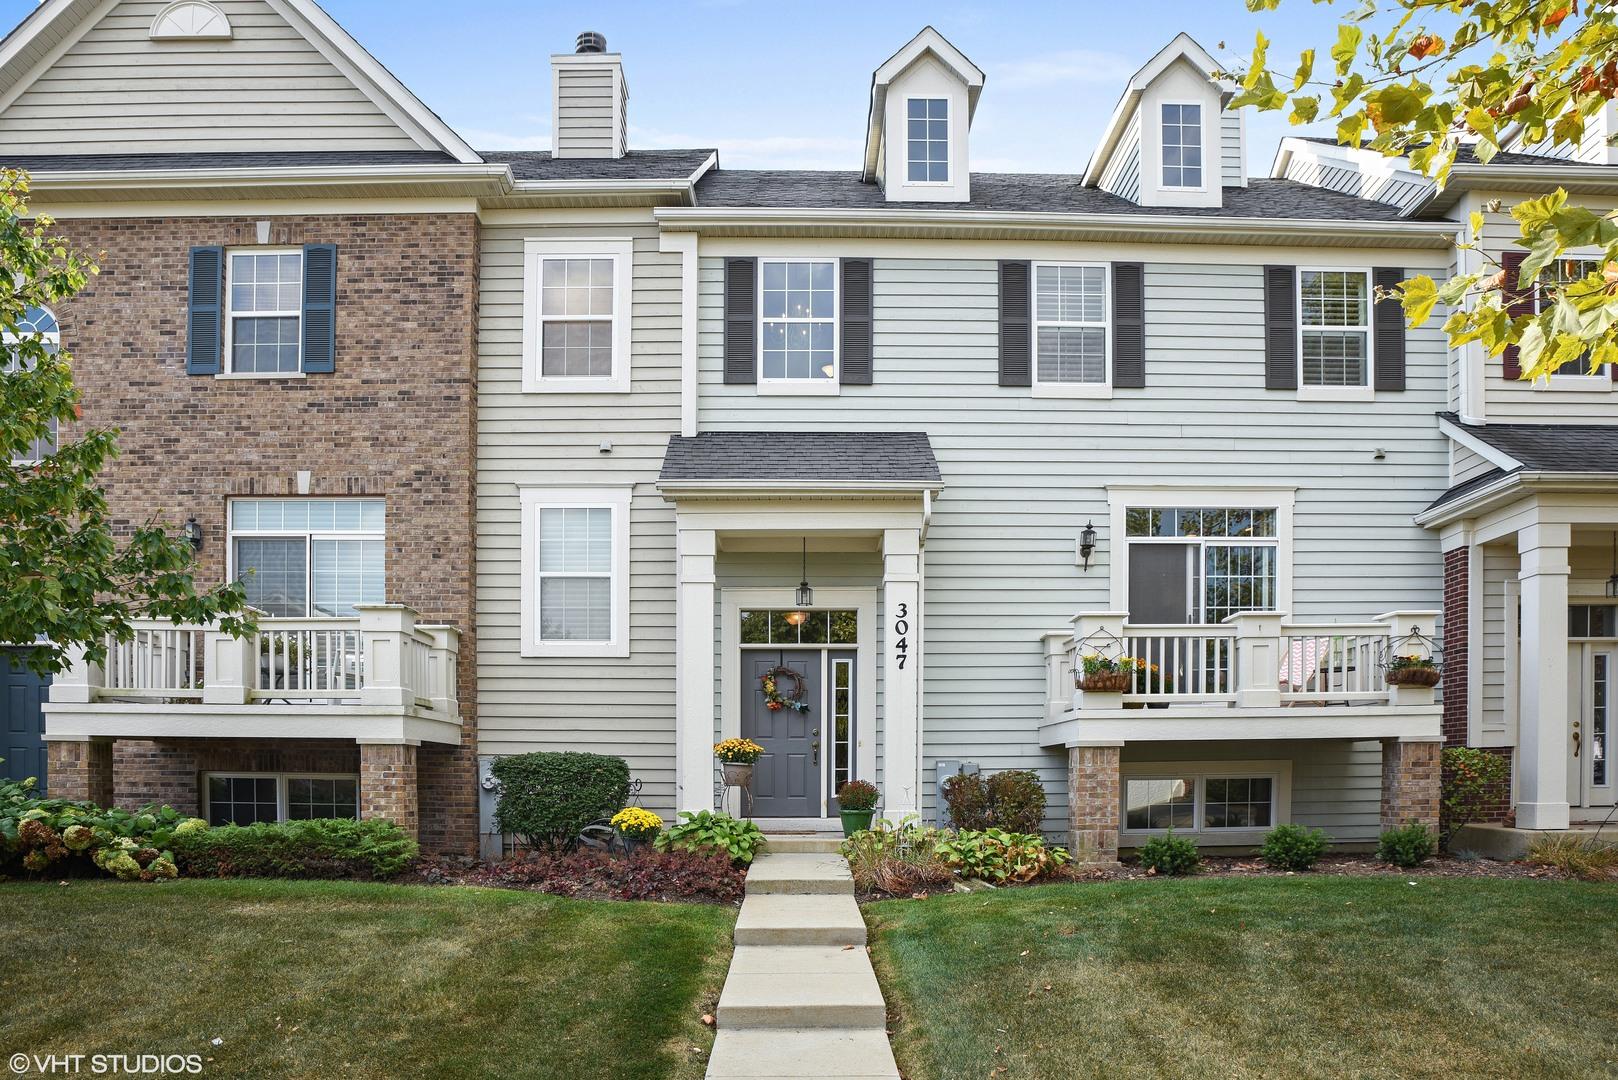 3029 cranston avenue elgin il 60124 properties